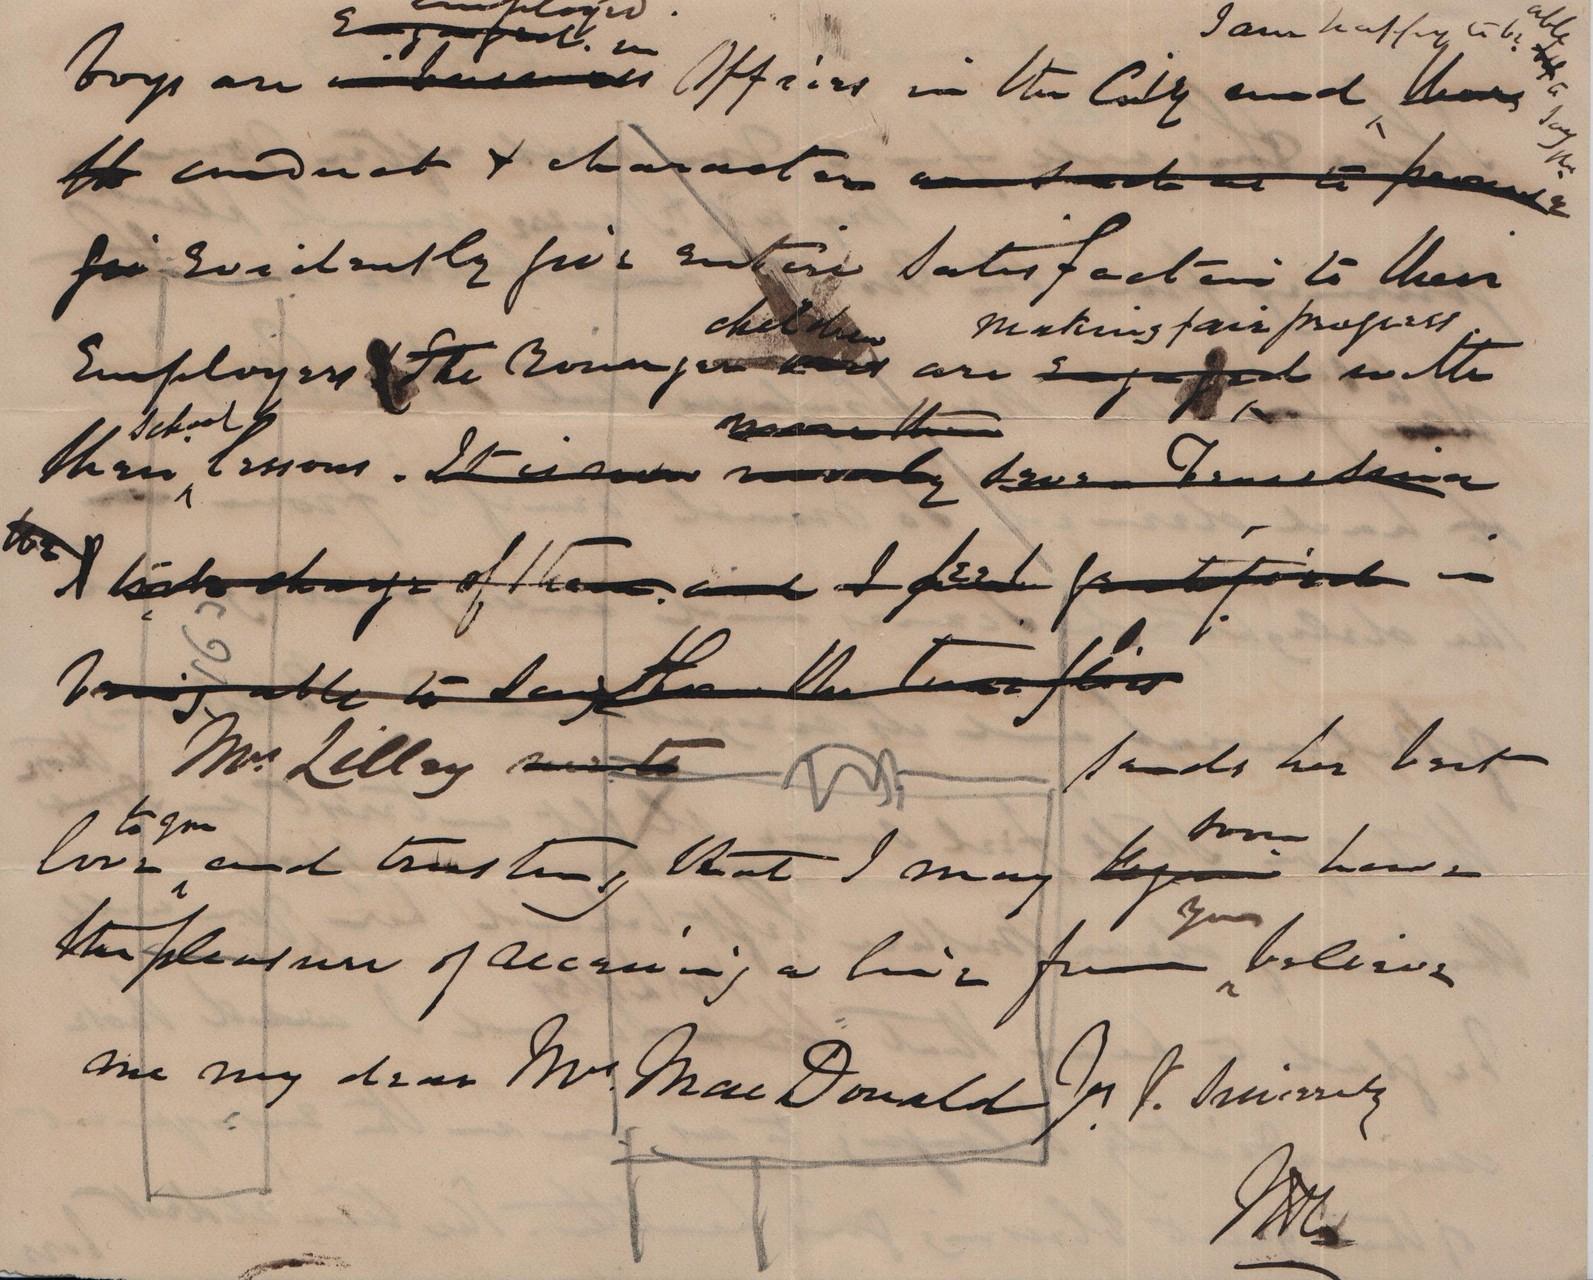 1883 November 23rd JHL to AMcD